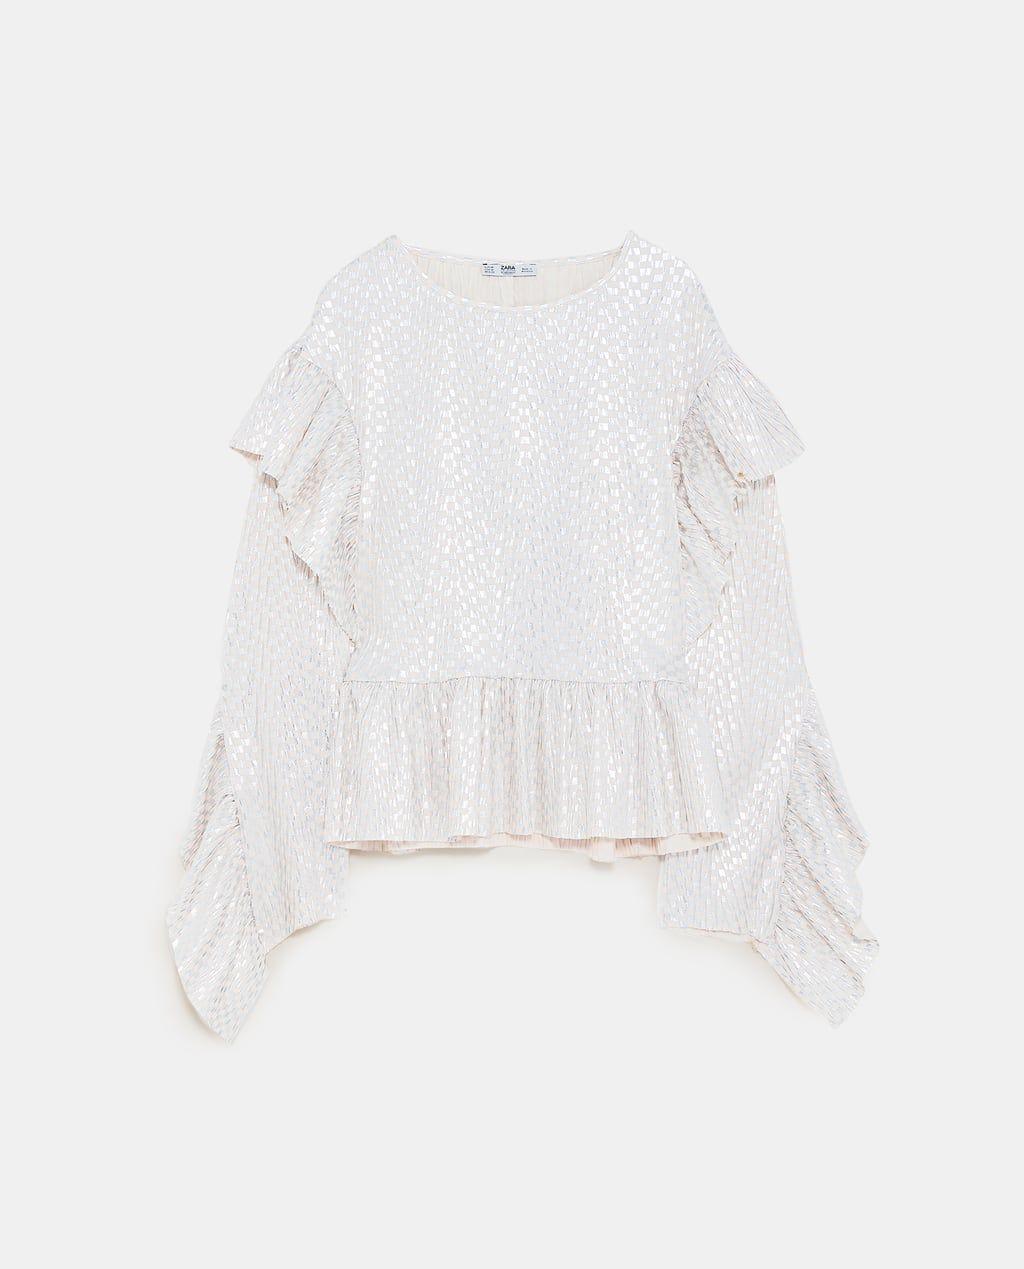 ec0ac80150a6fa Image 6 of SHINY TOP WITH RUFFLES from Zara | Zara Cart in 2019 ...